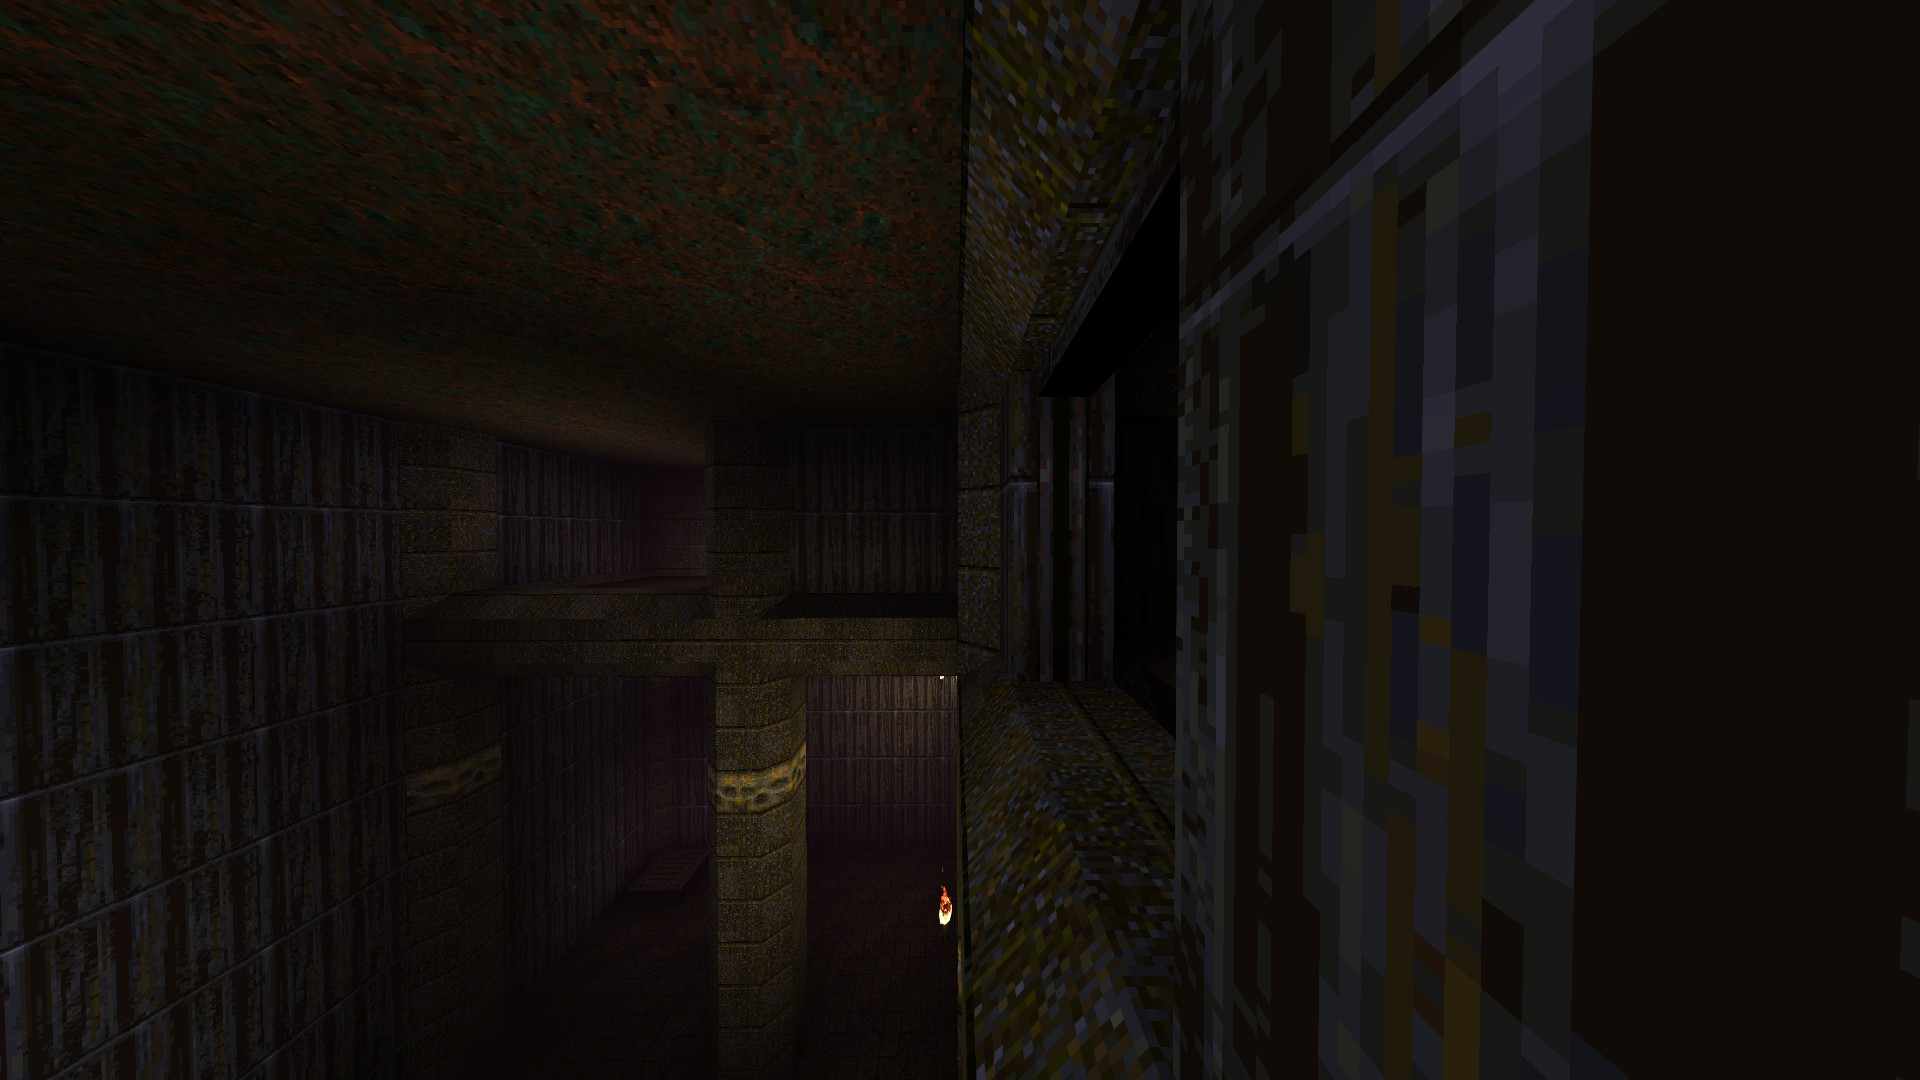 Quake - Locations of All Secrets in Game Tips - E2: Dominion of Darkness - Part II - FF7CB2F